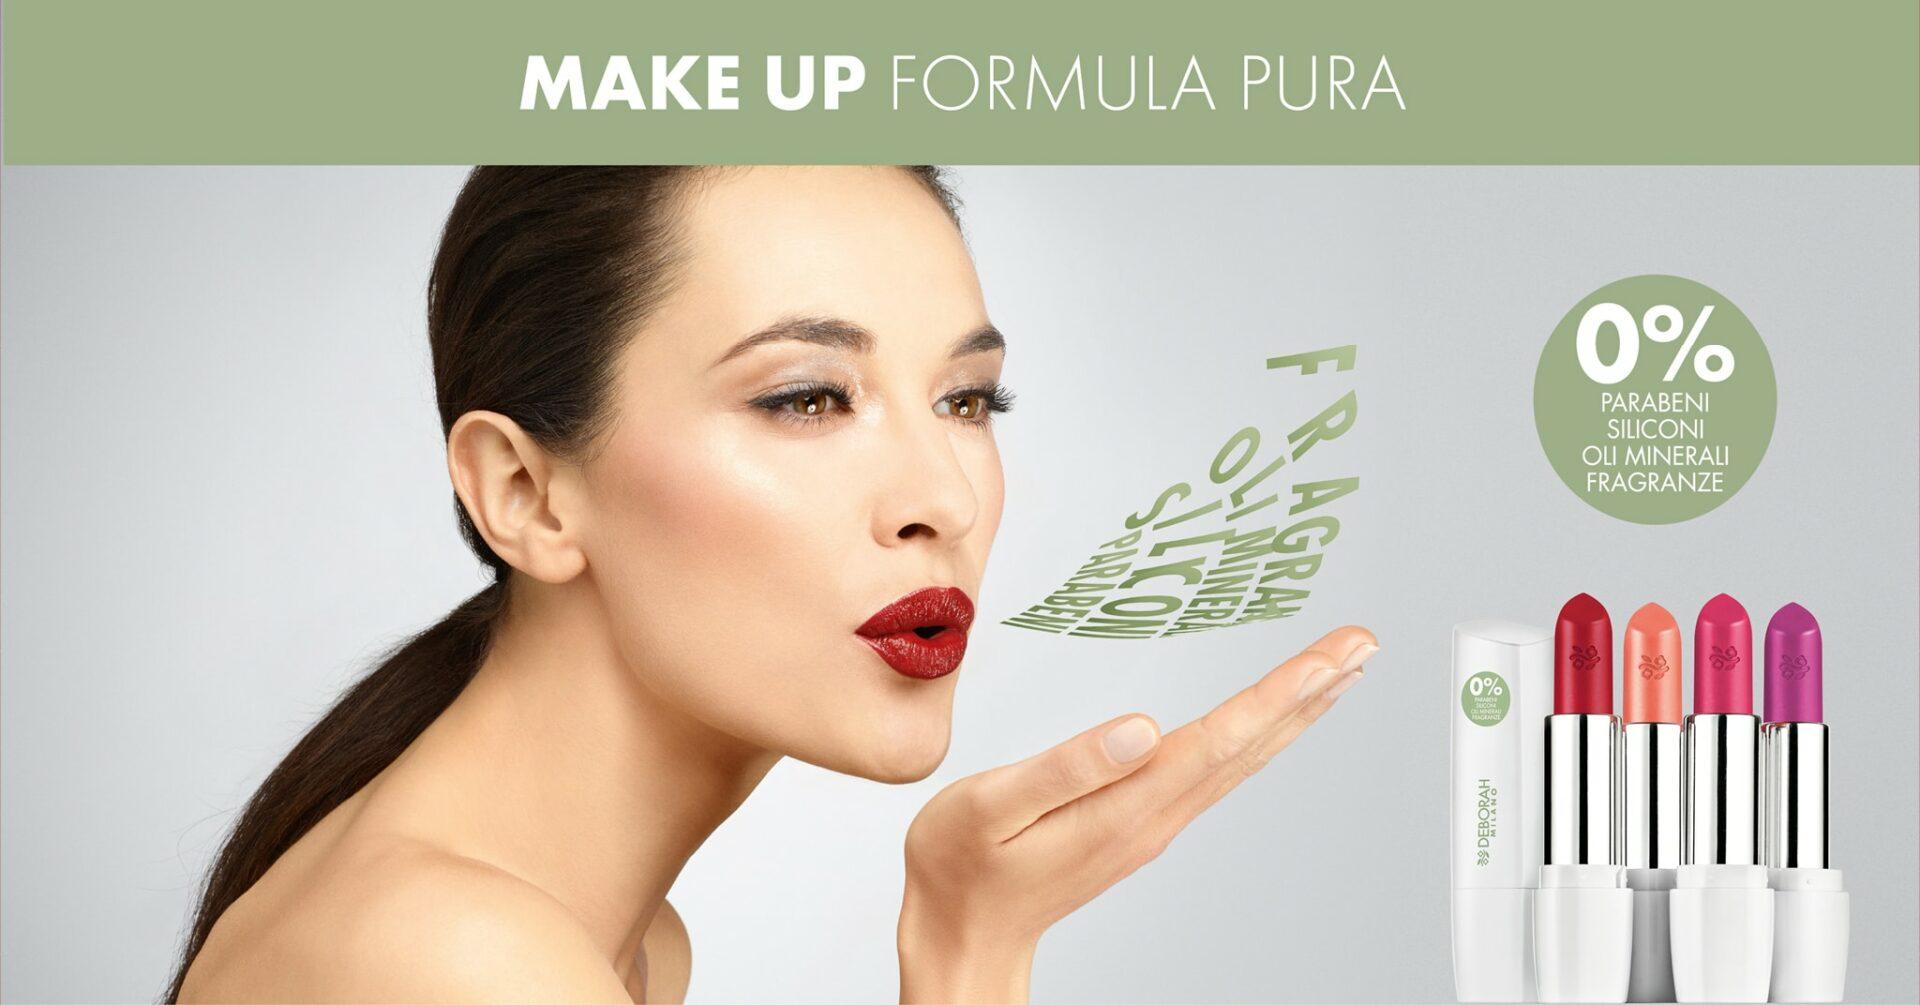 Maquillage Naturel, notre nouvelle gamme Deborah Milano Pura